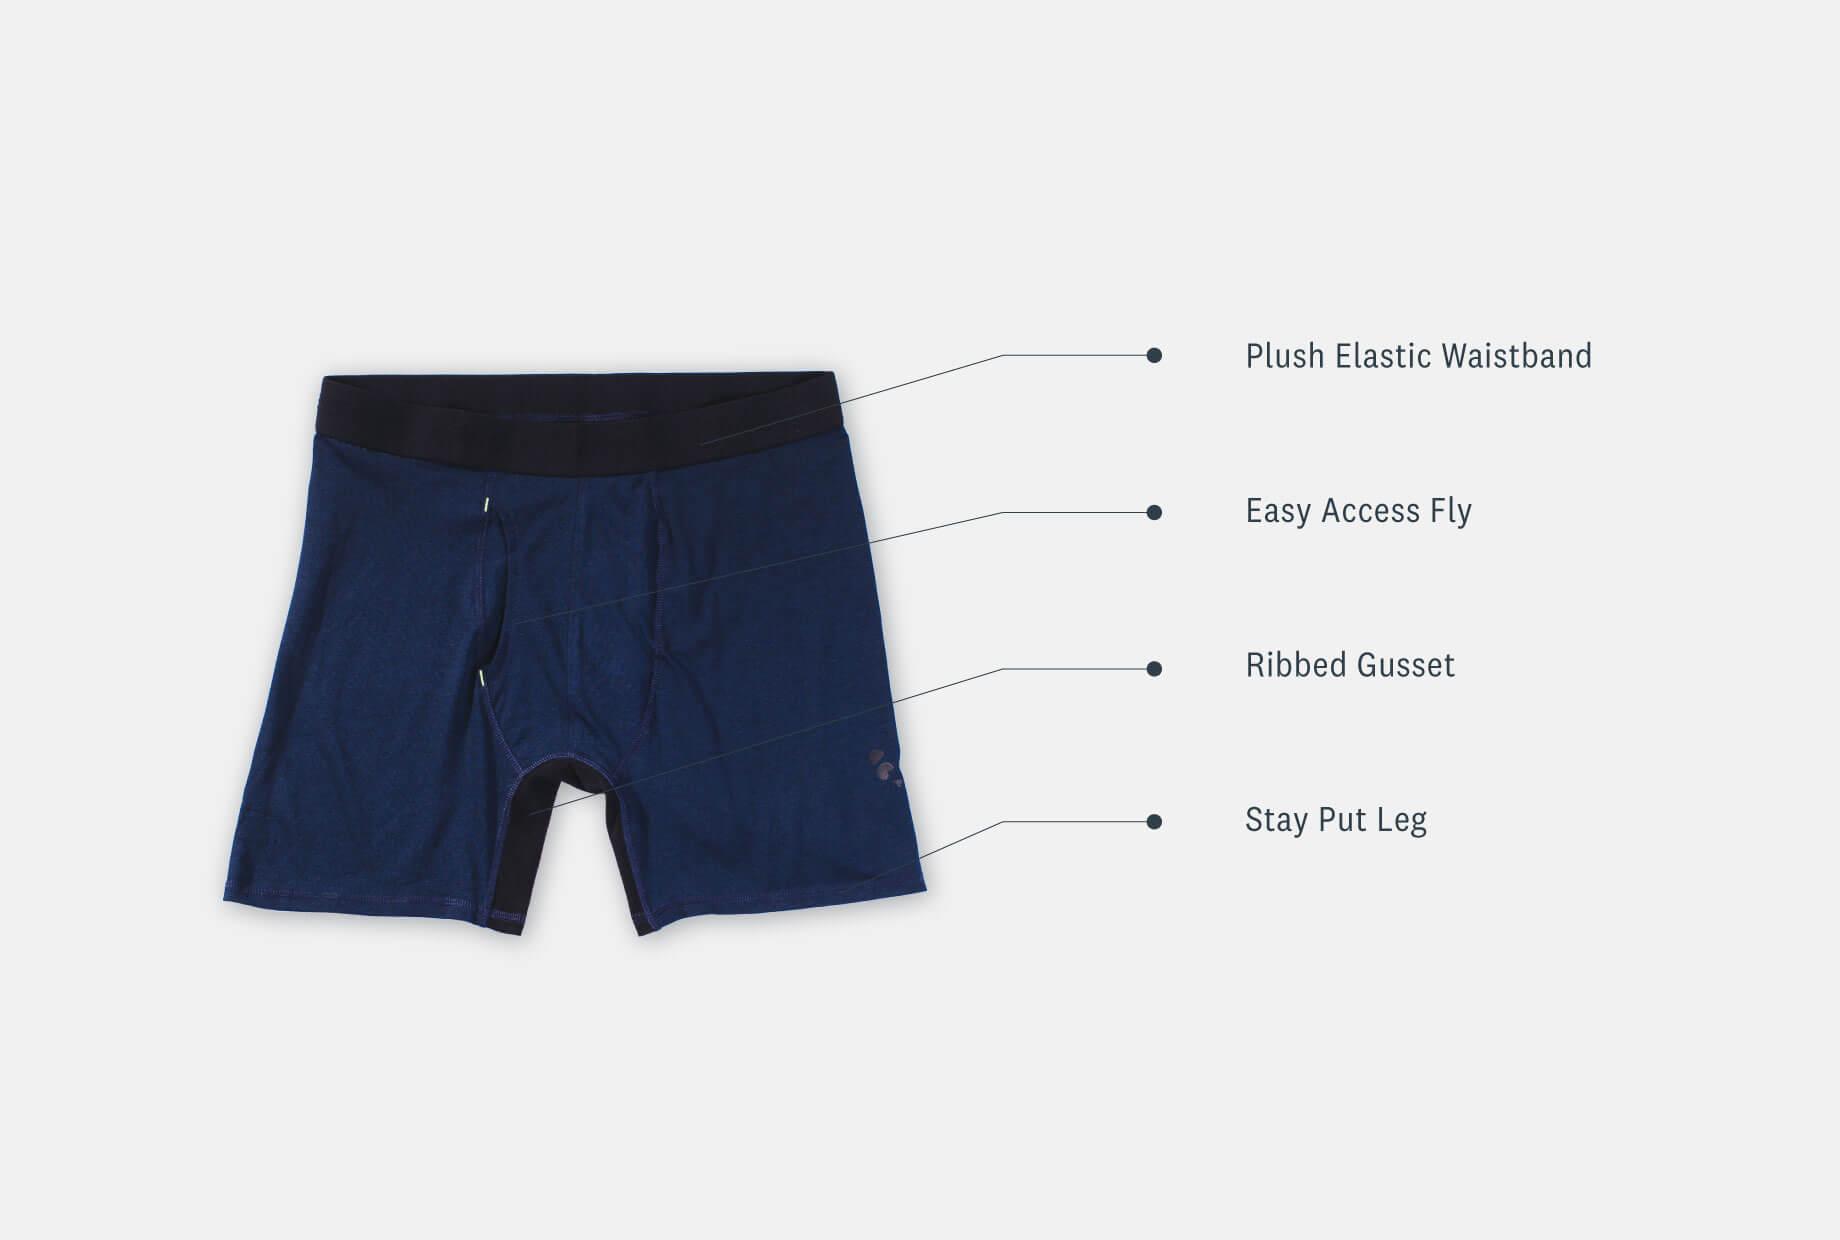 Men's Bamboo Bam(Bare) Boxer Brief Underwear